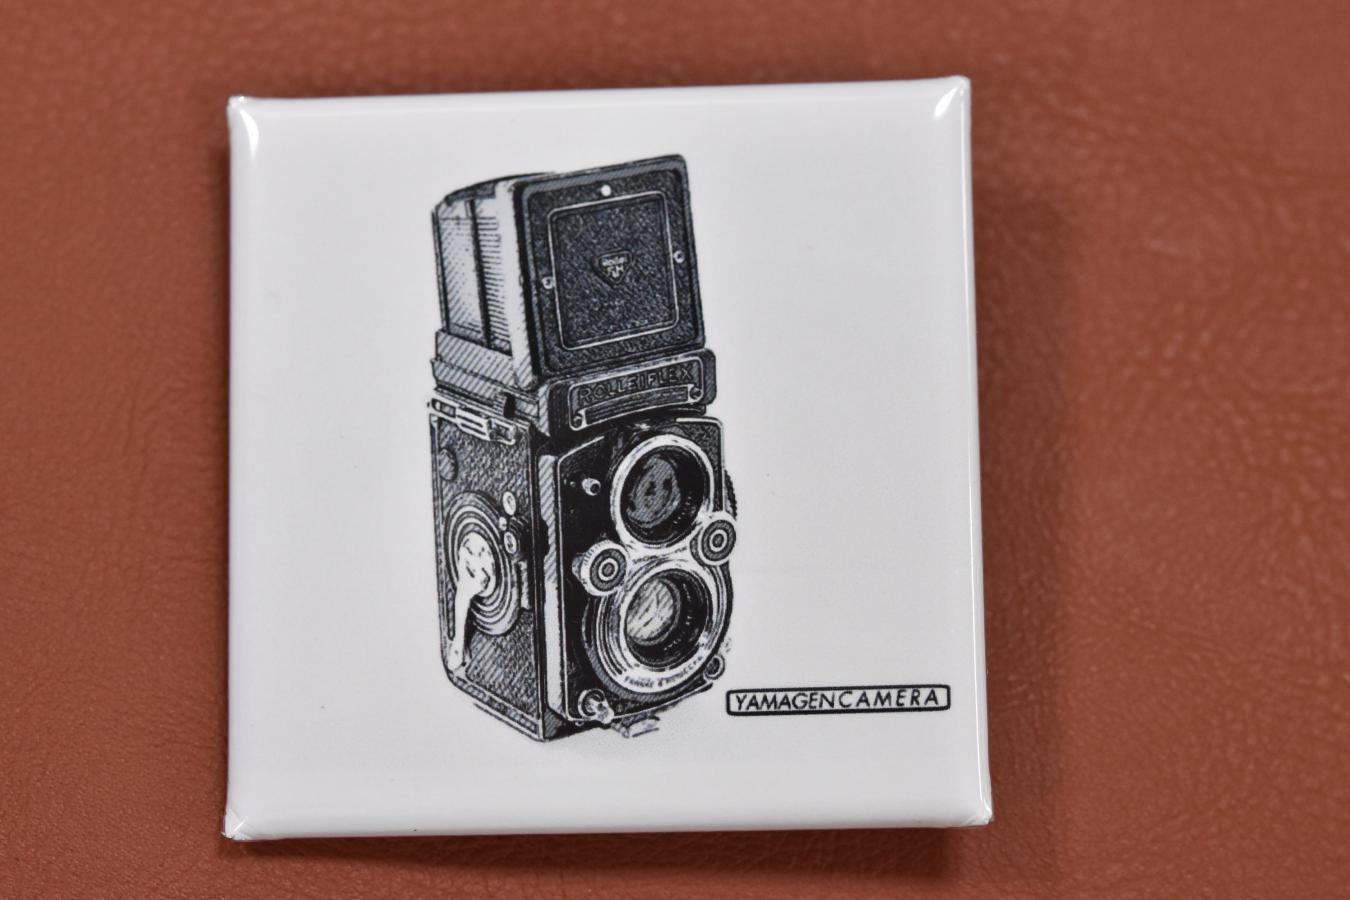 YAMAGEN CAMERA original カメラVer. 【缶バッジ3枚セット】